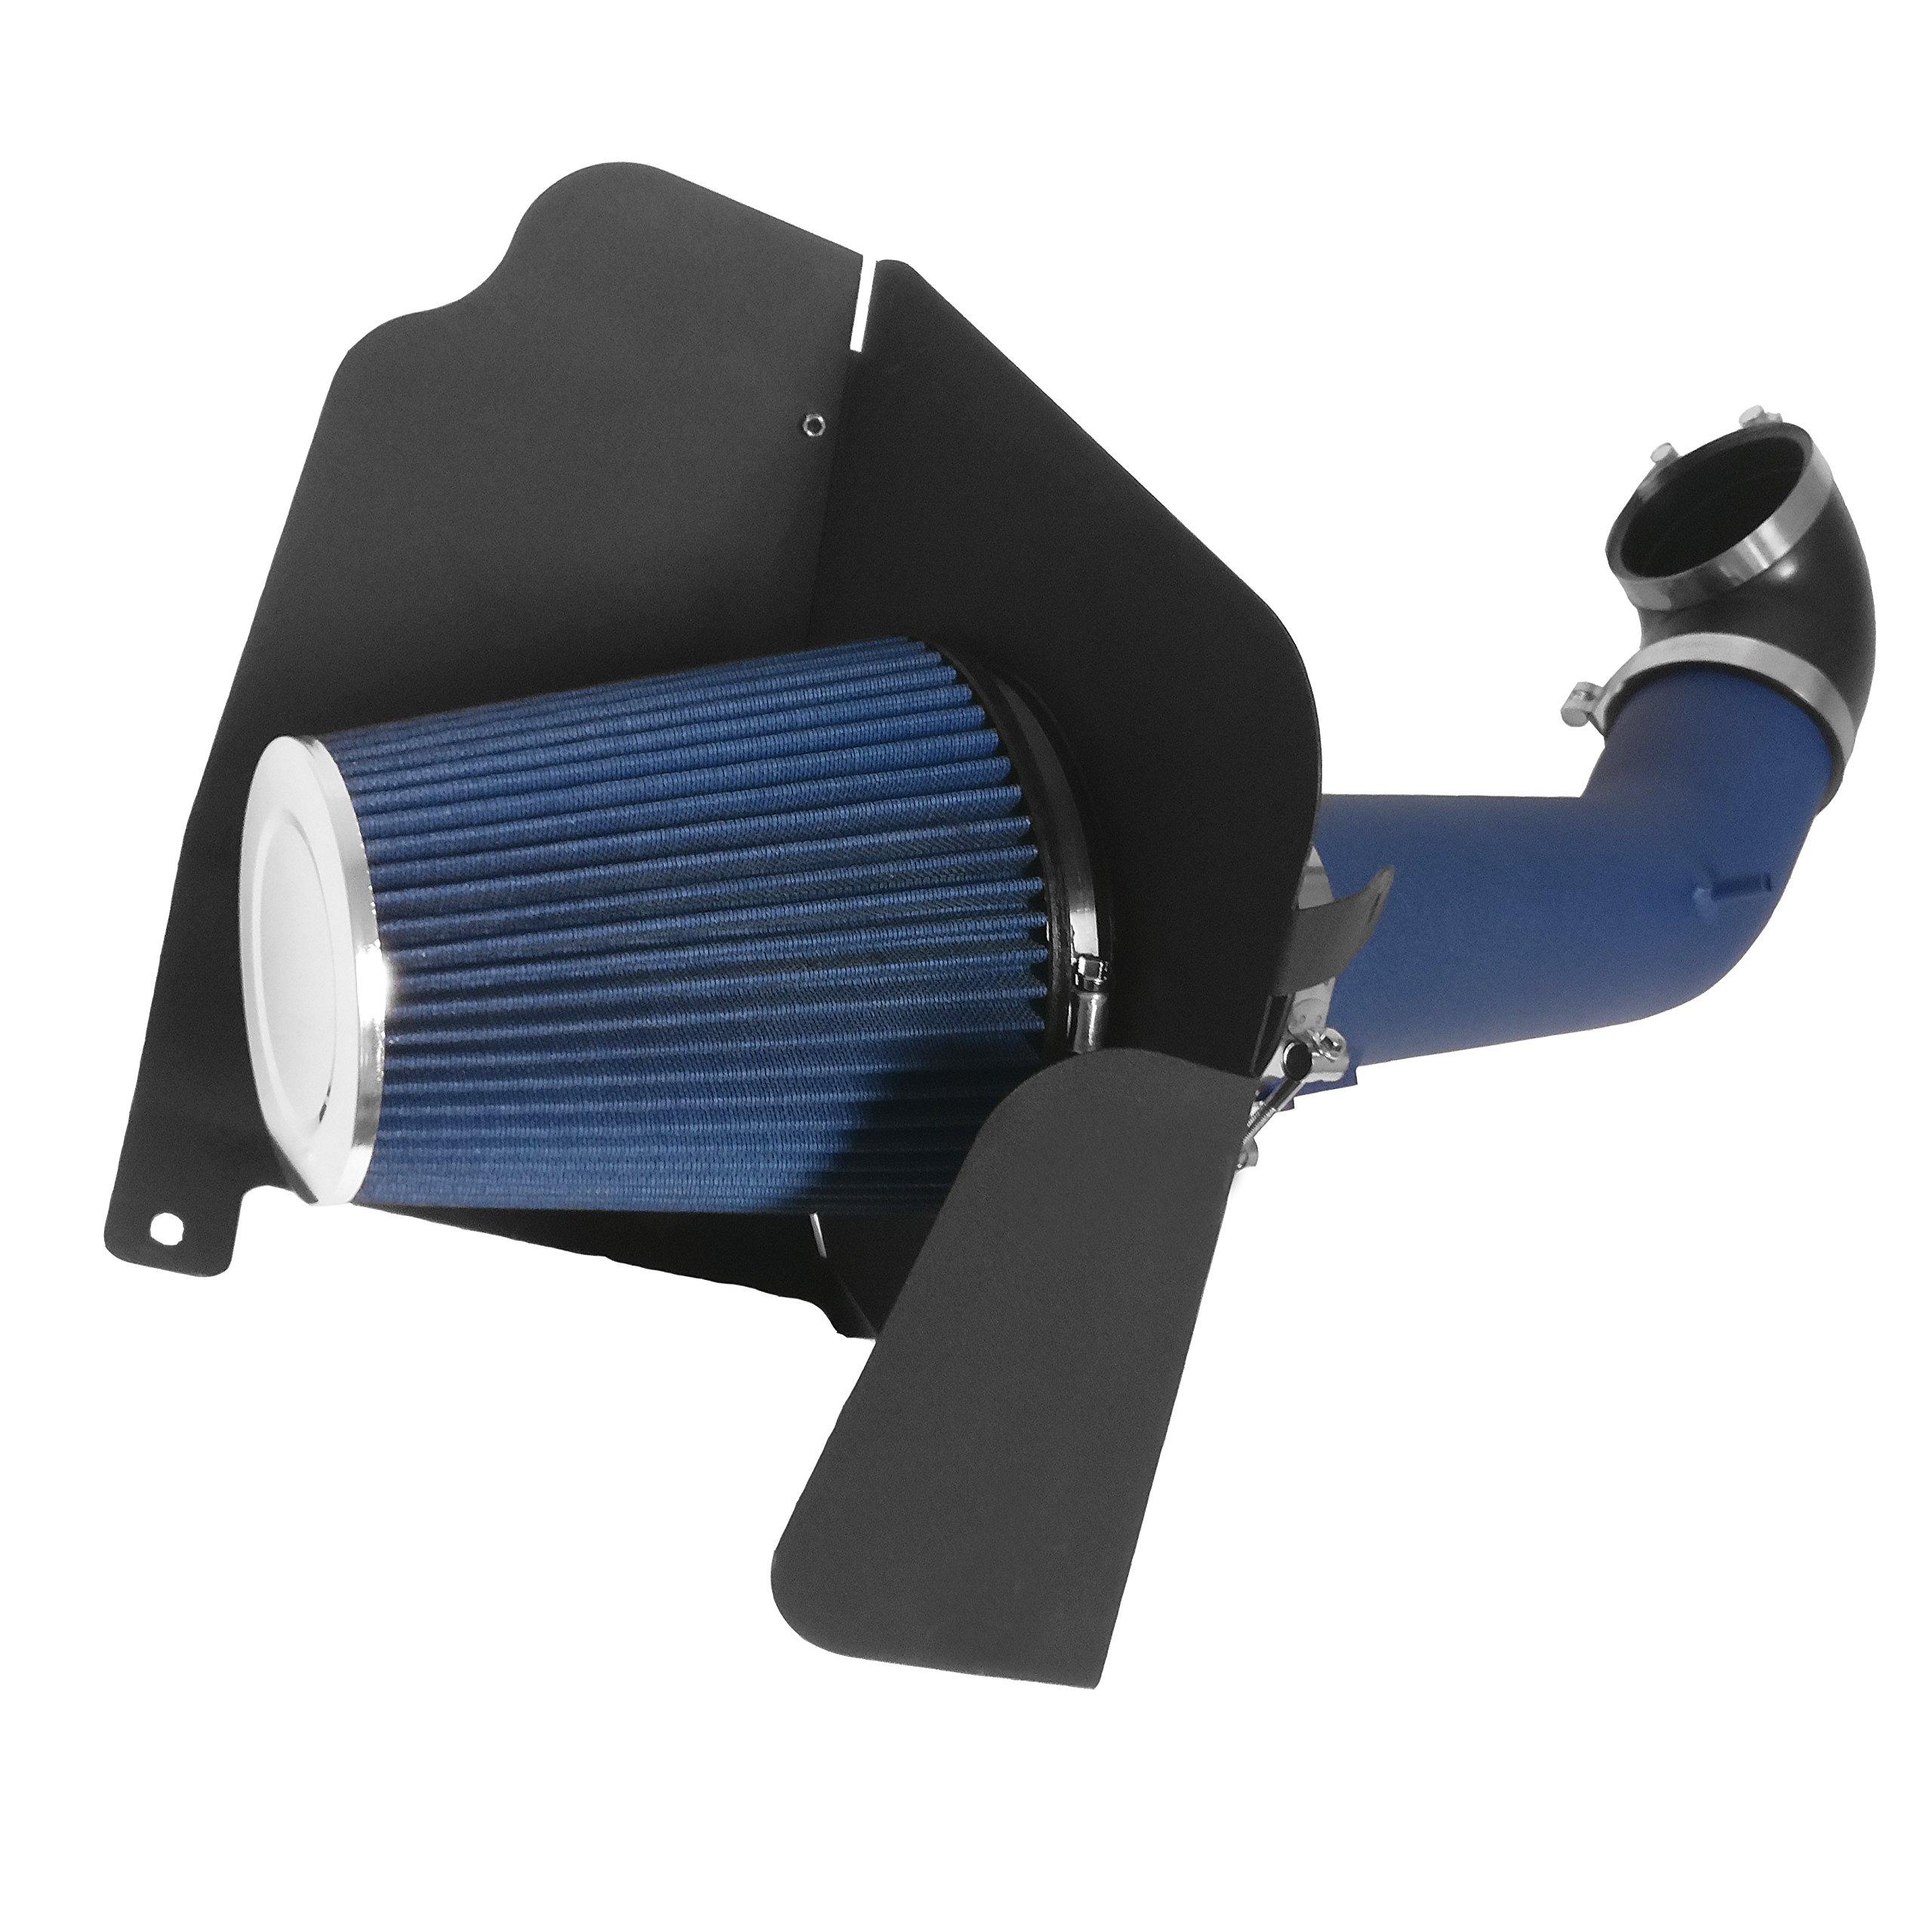 Cheap Heat Shield For Air Intake, find Heat Shield For Air ...